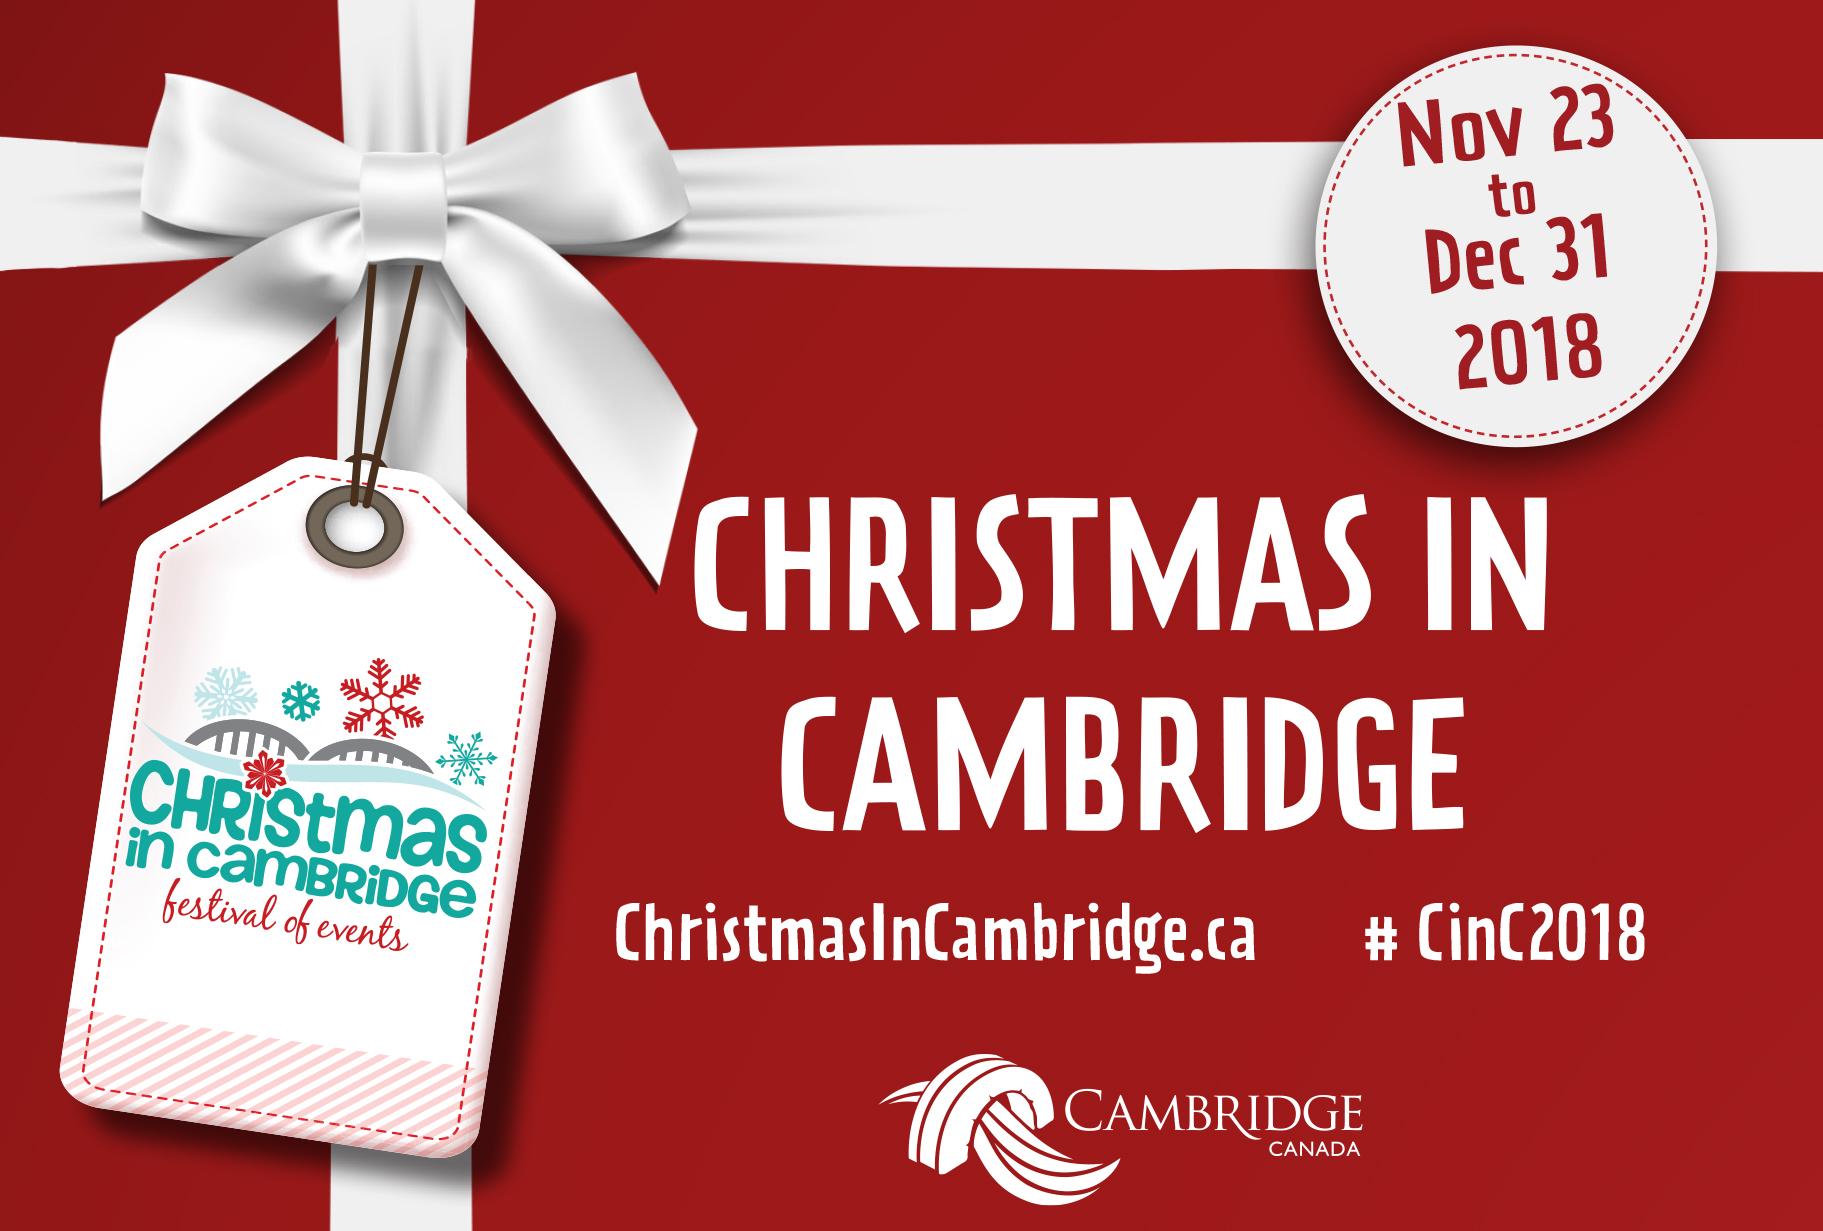 Christmas in Cambridge 2018